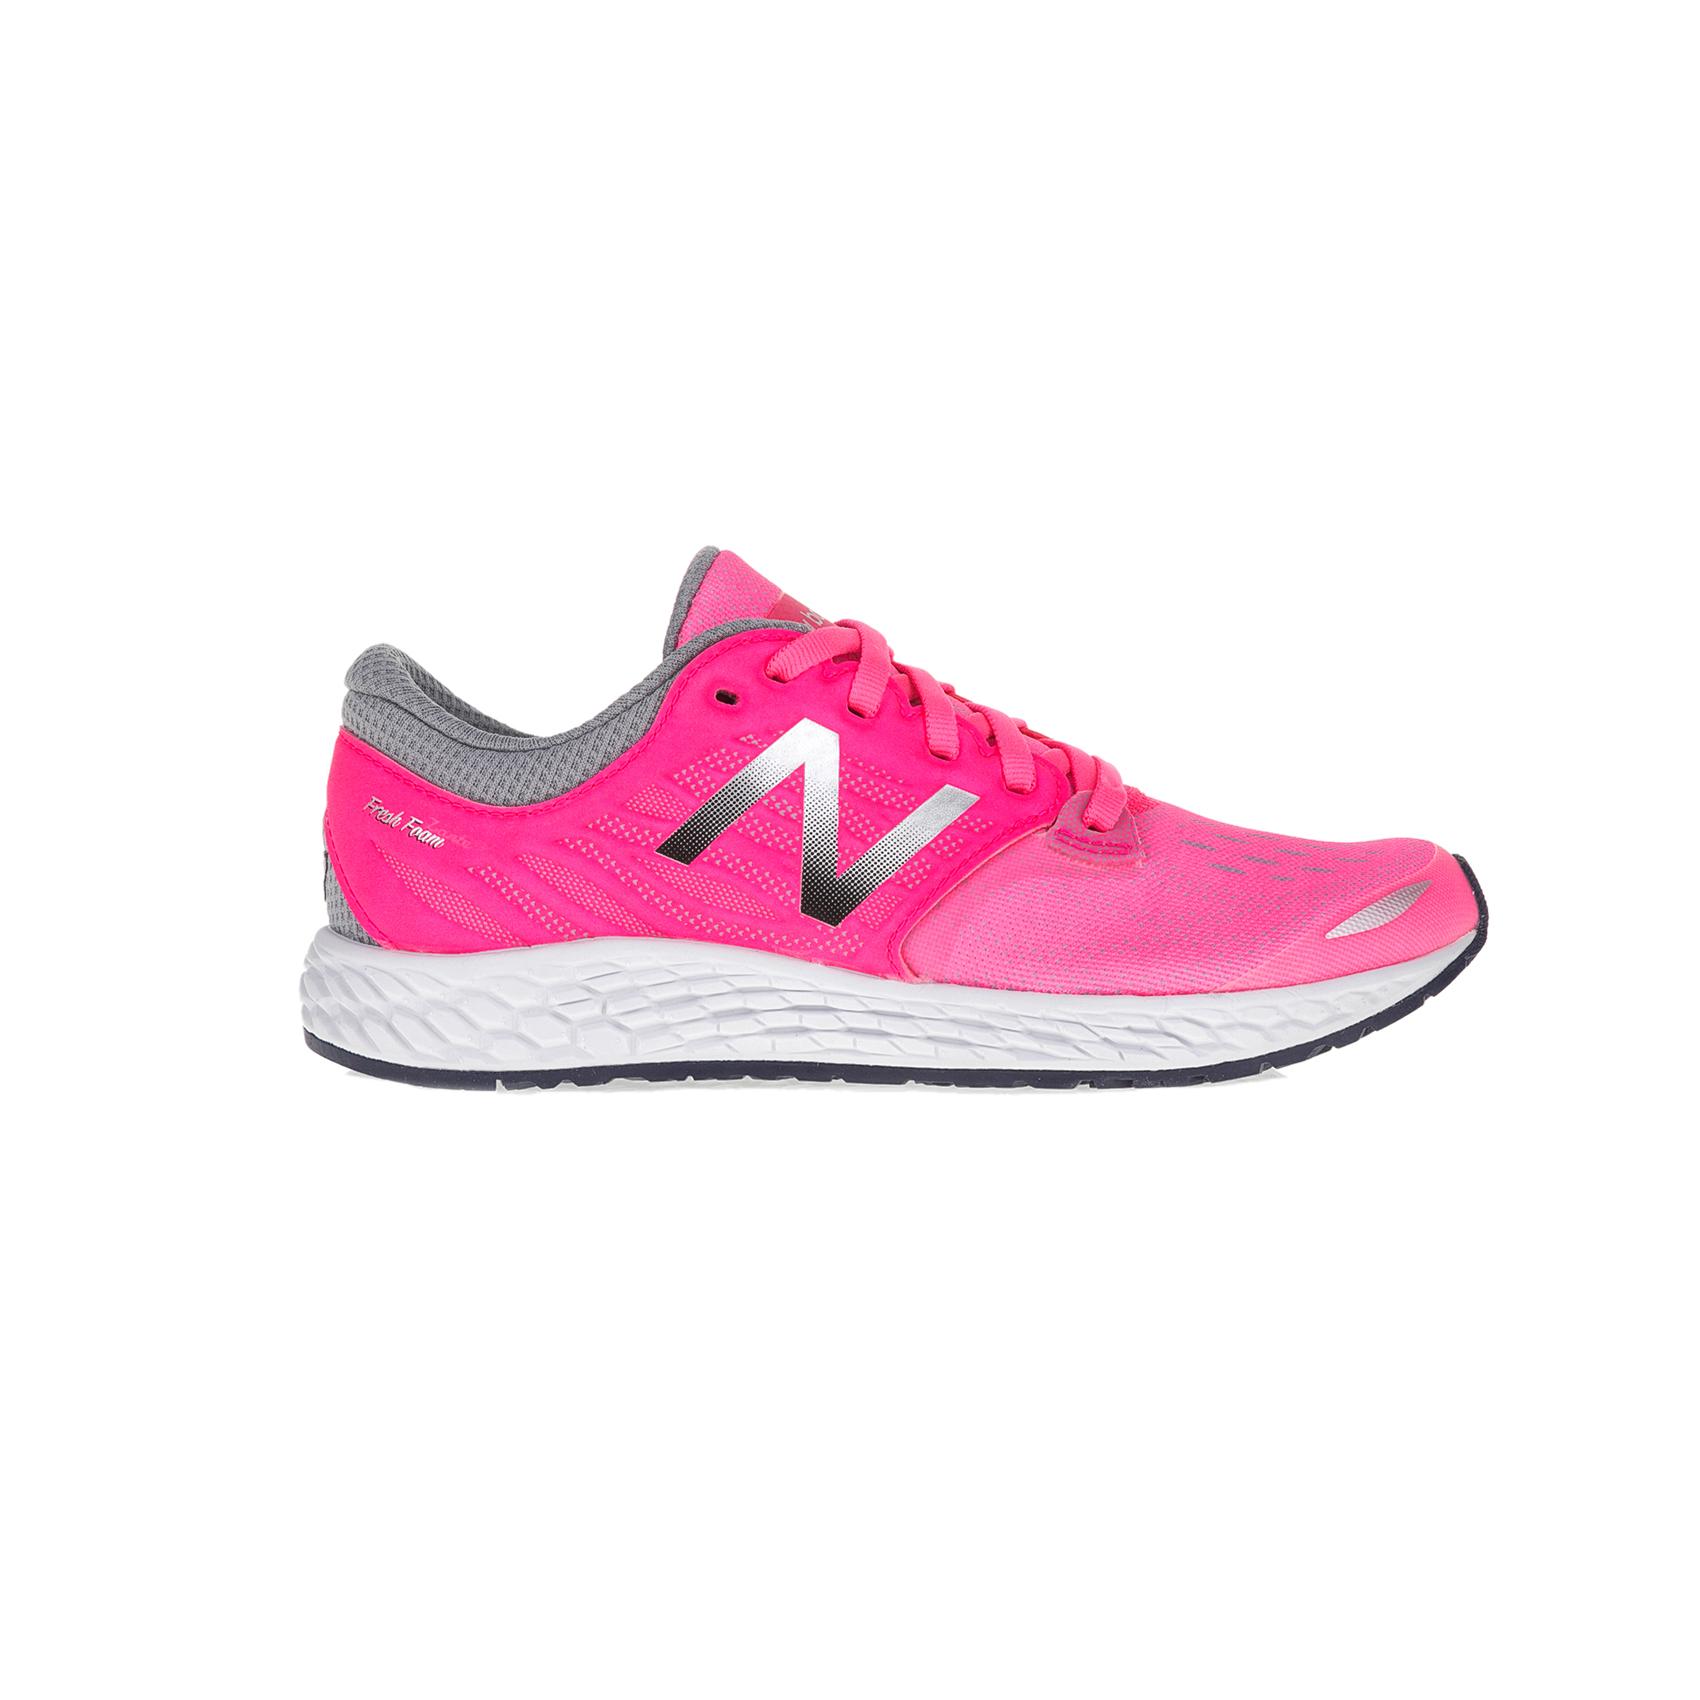 NEW BALANCE – Κοριτσίστικα παπούτσια NEW BALANCE KJZNTUPG φούξια